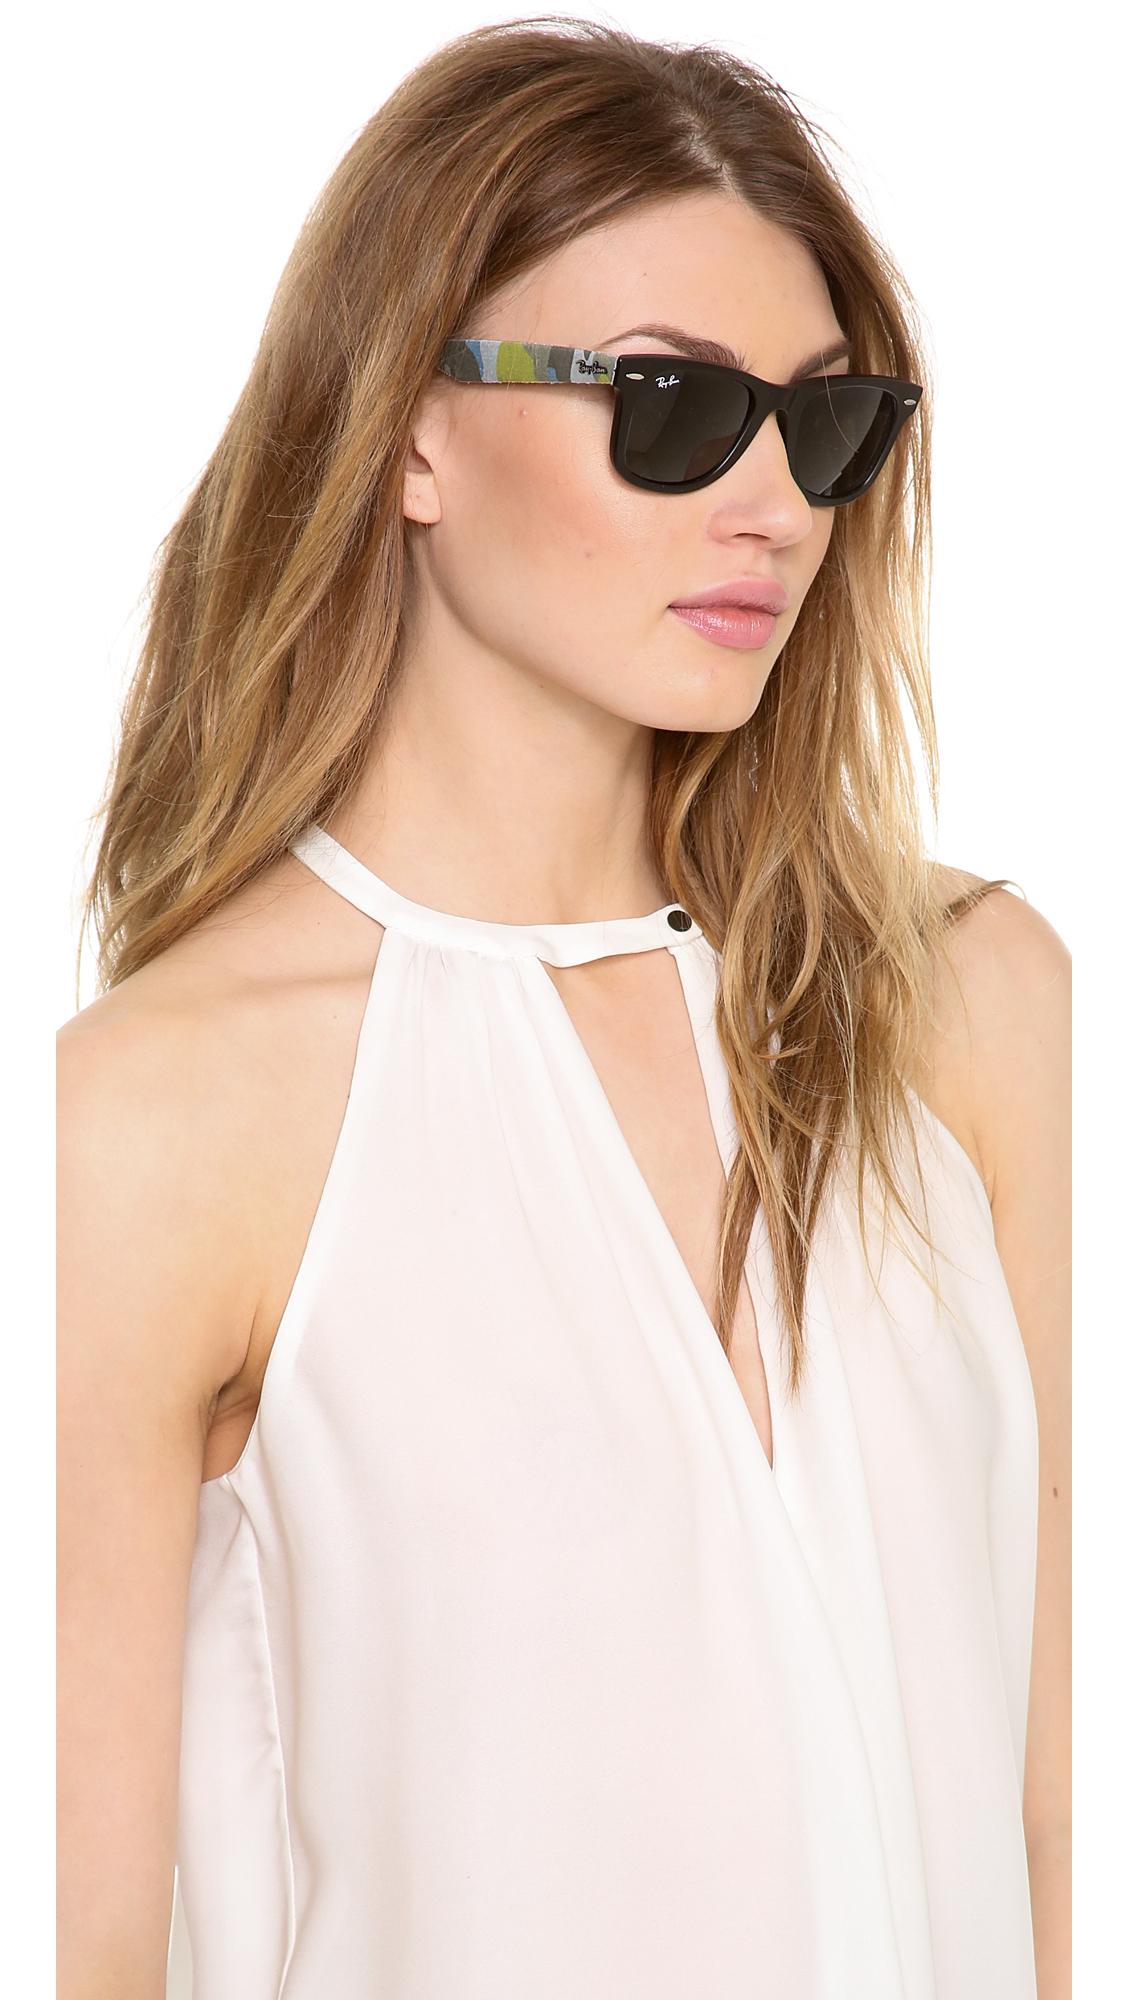 ray bans on sale wayfarers  Ray-ban Camouflage Wayfarer Sunglasses